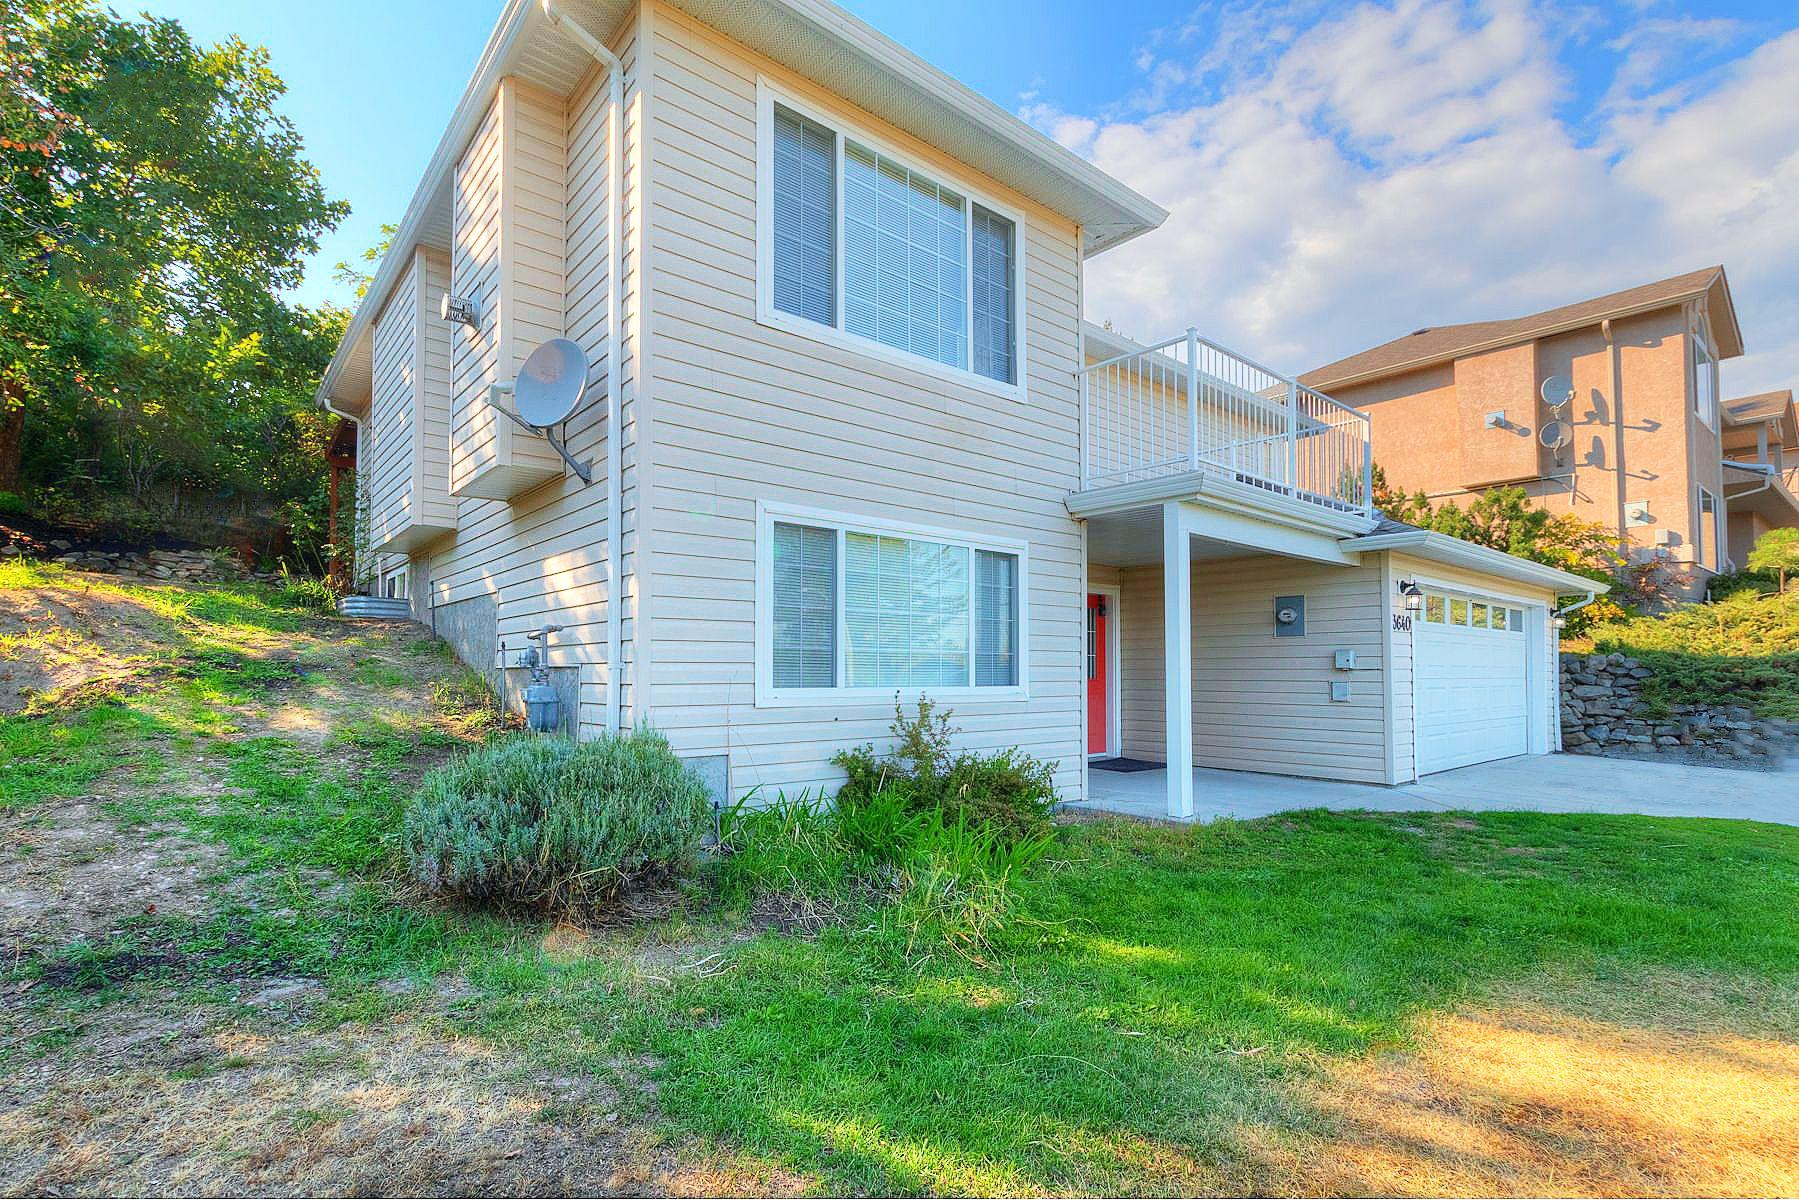 Main Photo: 3640 Webber Road in West Kelowna: Glenrosa House for sale (Central Okanagan)  : MLS®# 10239925